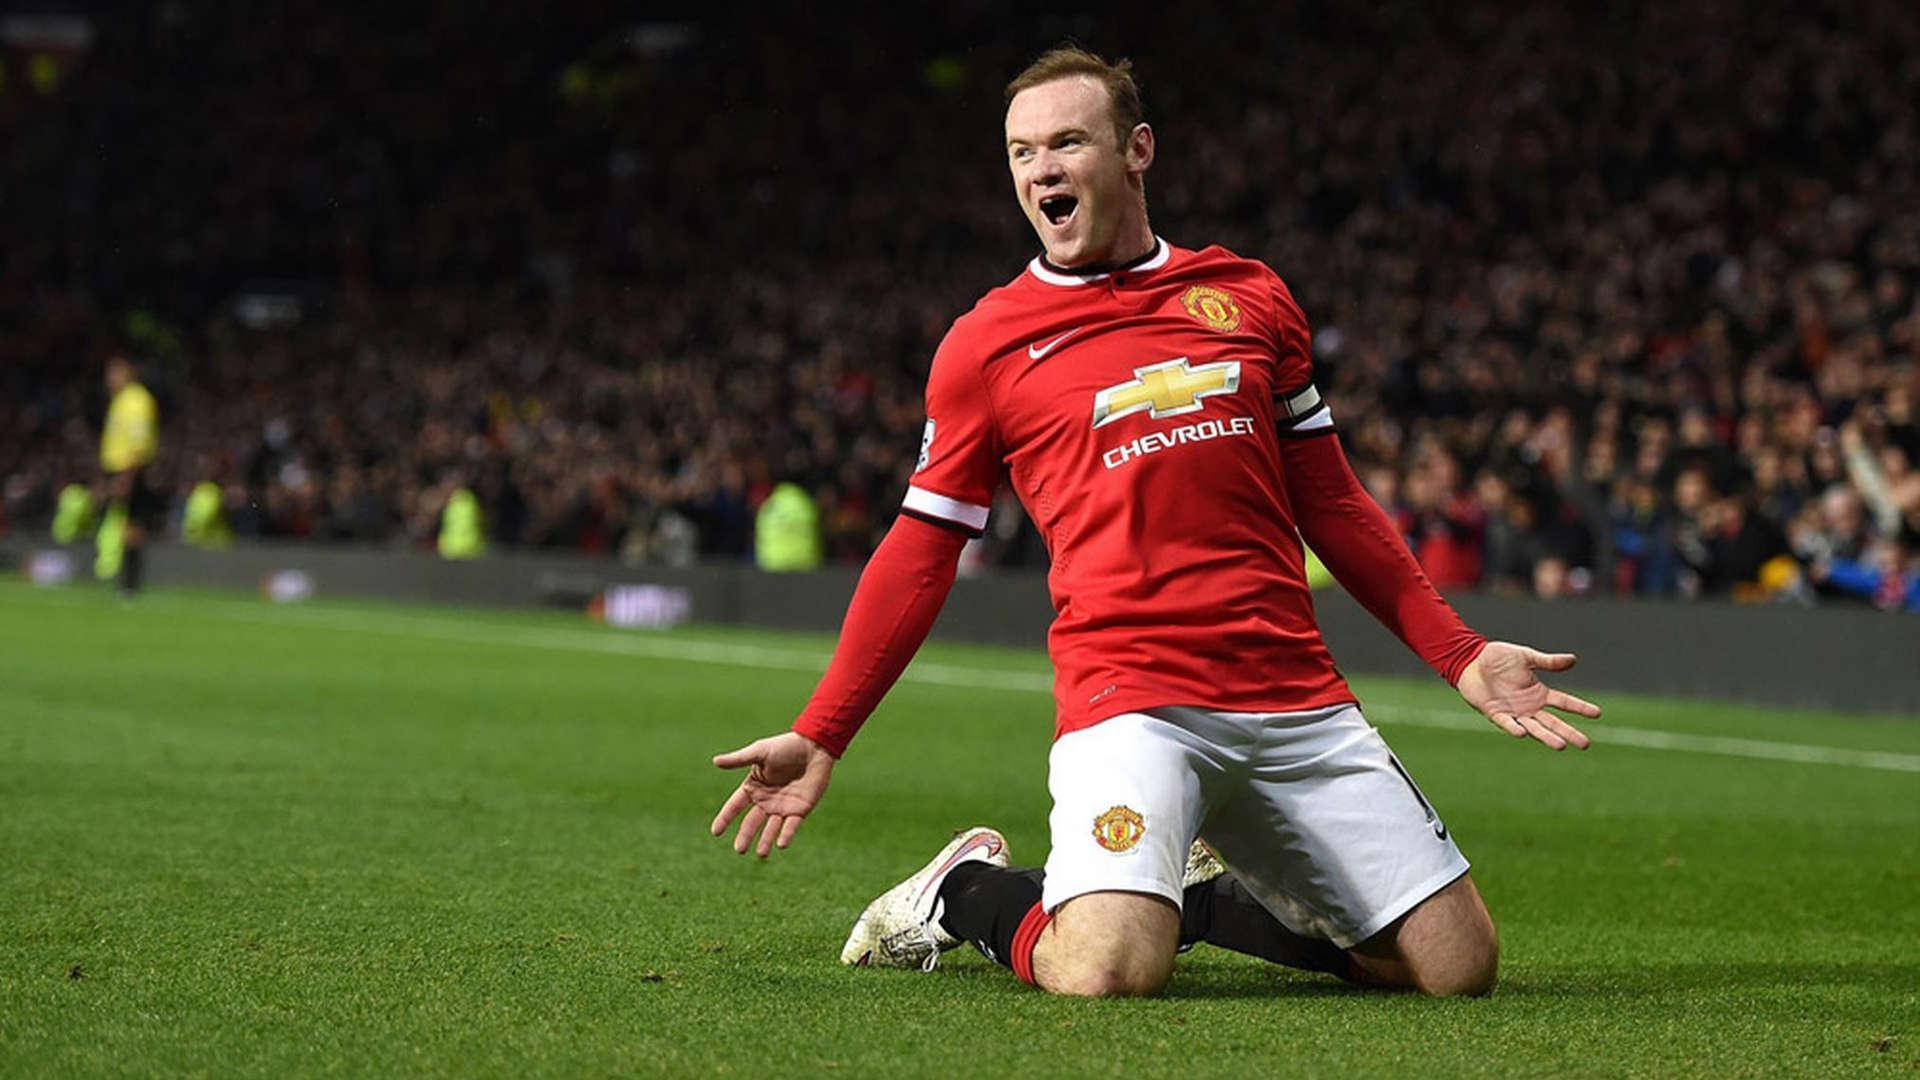 Wayne Rooney - ELLE Man - 7